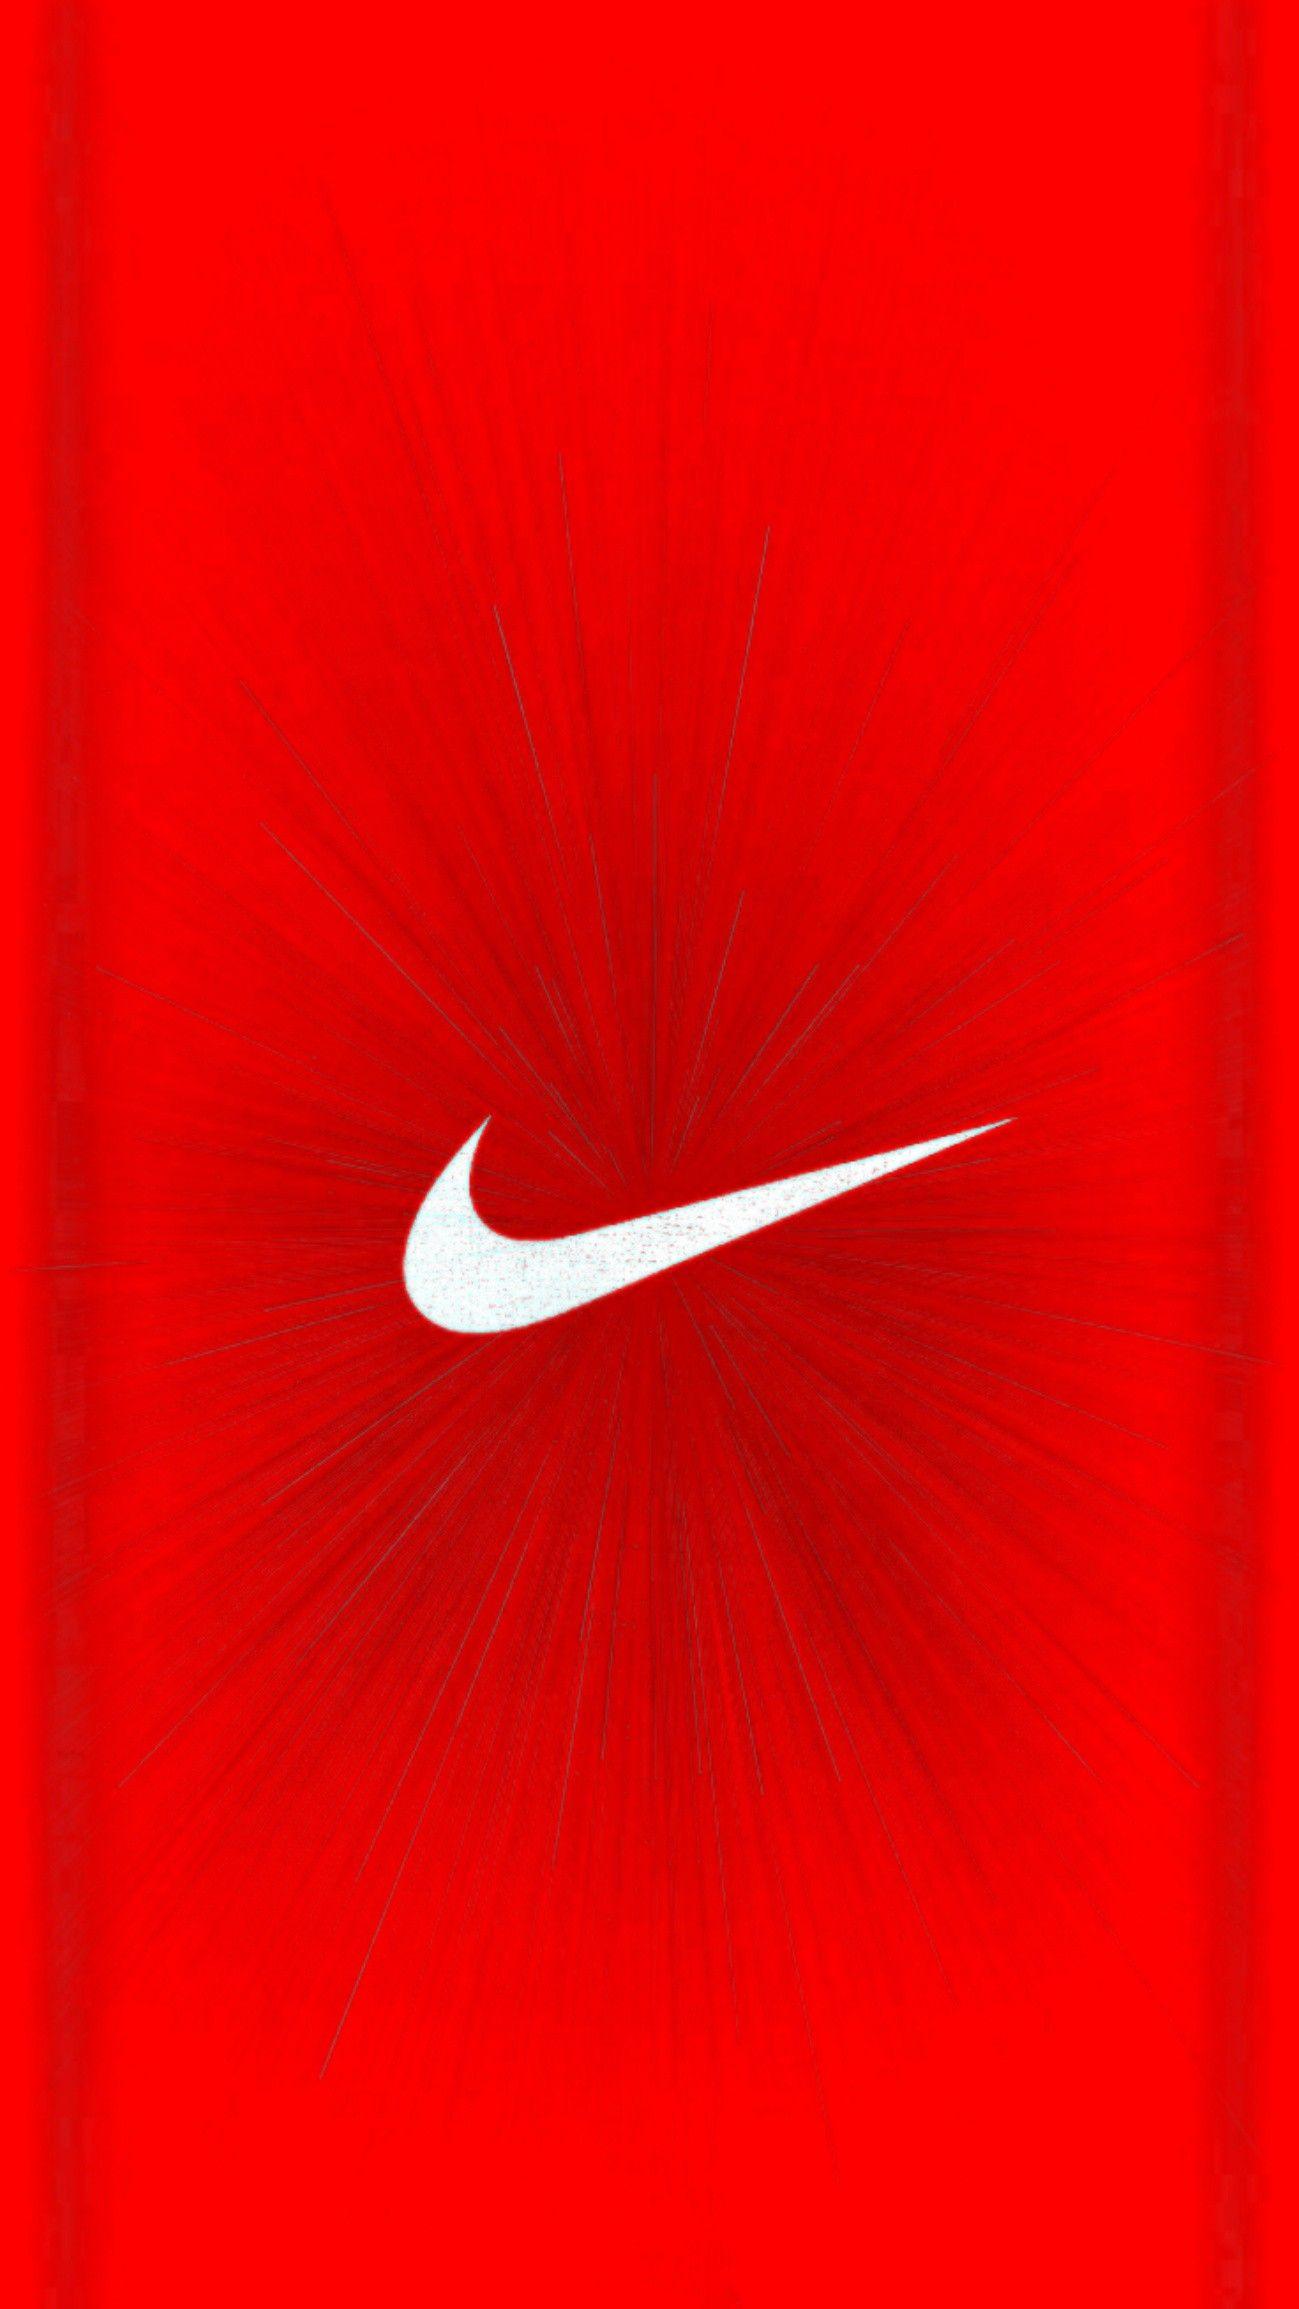 Pin By Amber Carney On Nike Wallpaper In 2020 Nike Wallpaper